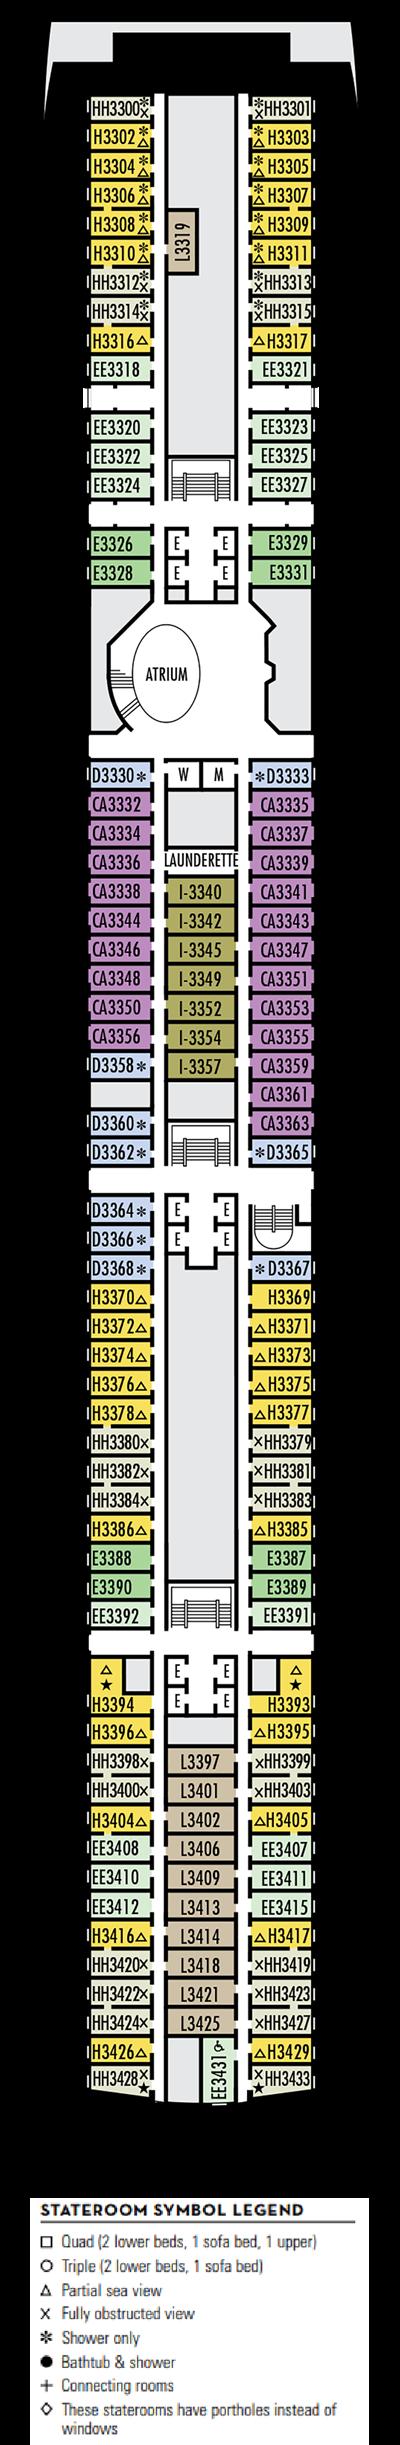 Deck 3 - HAL's Amsterdam